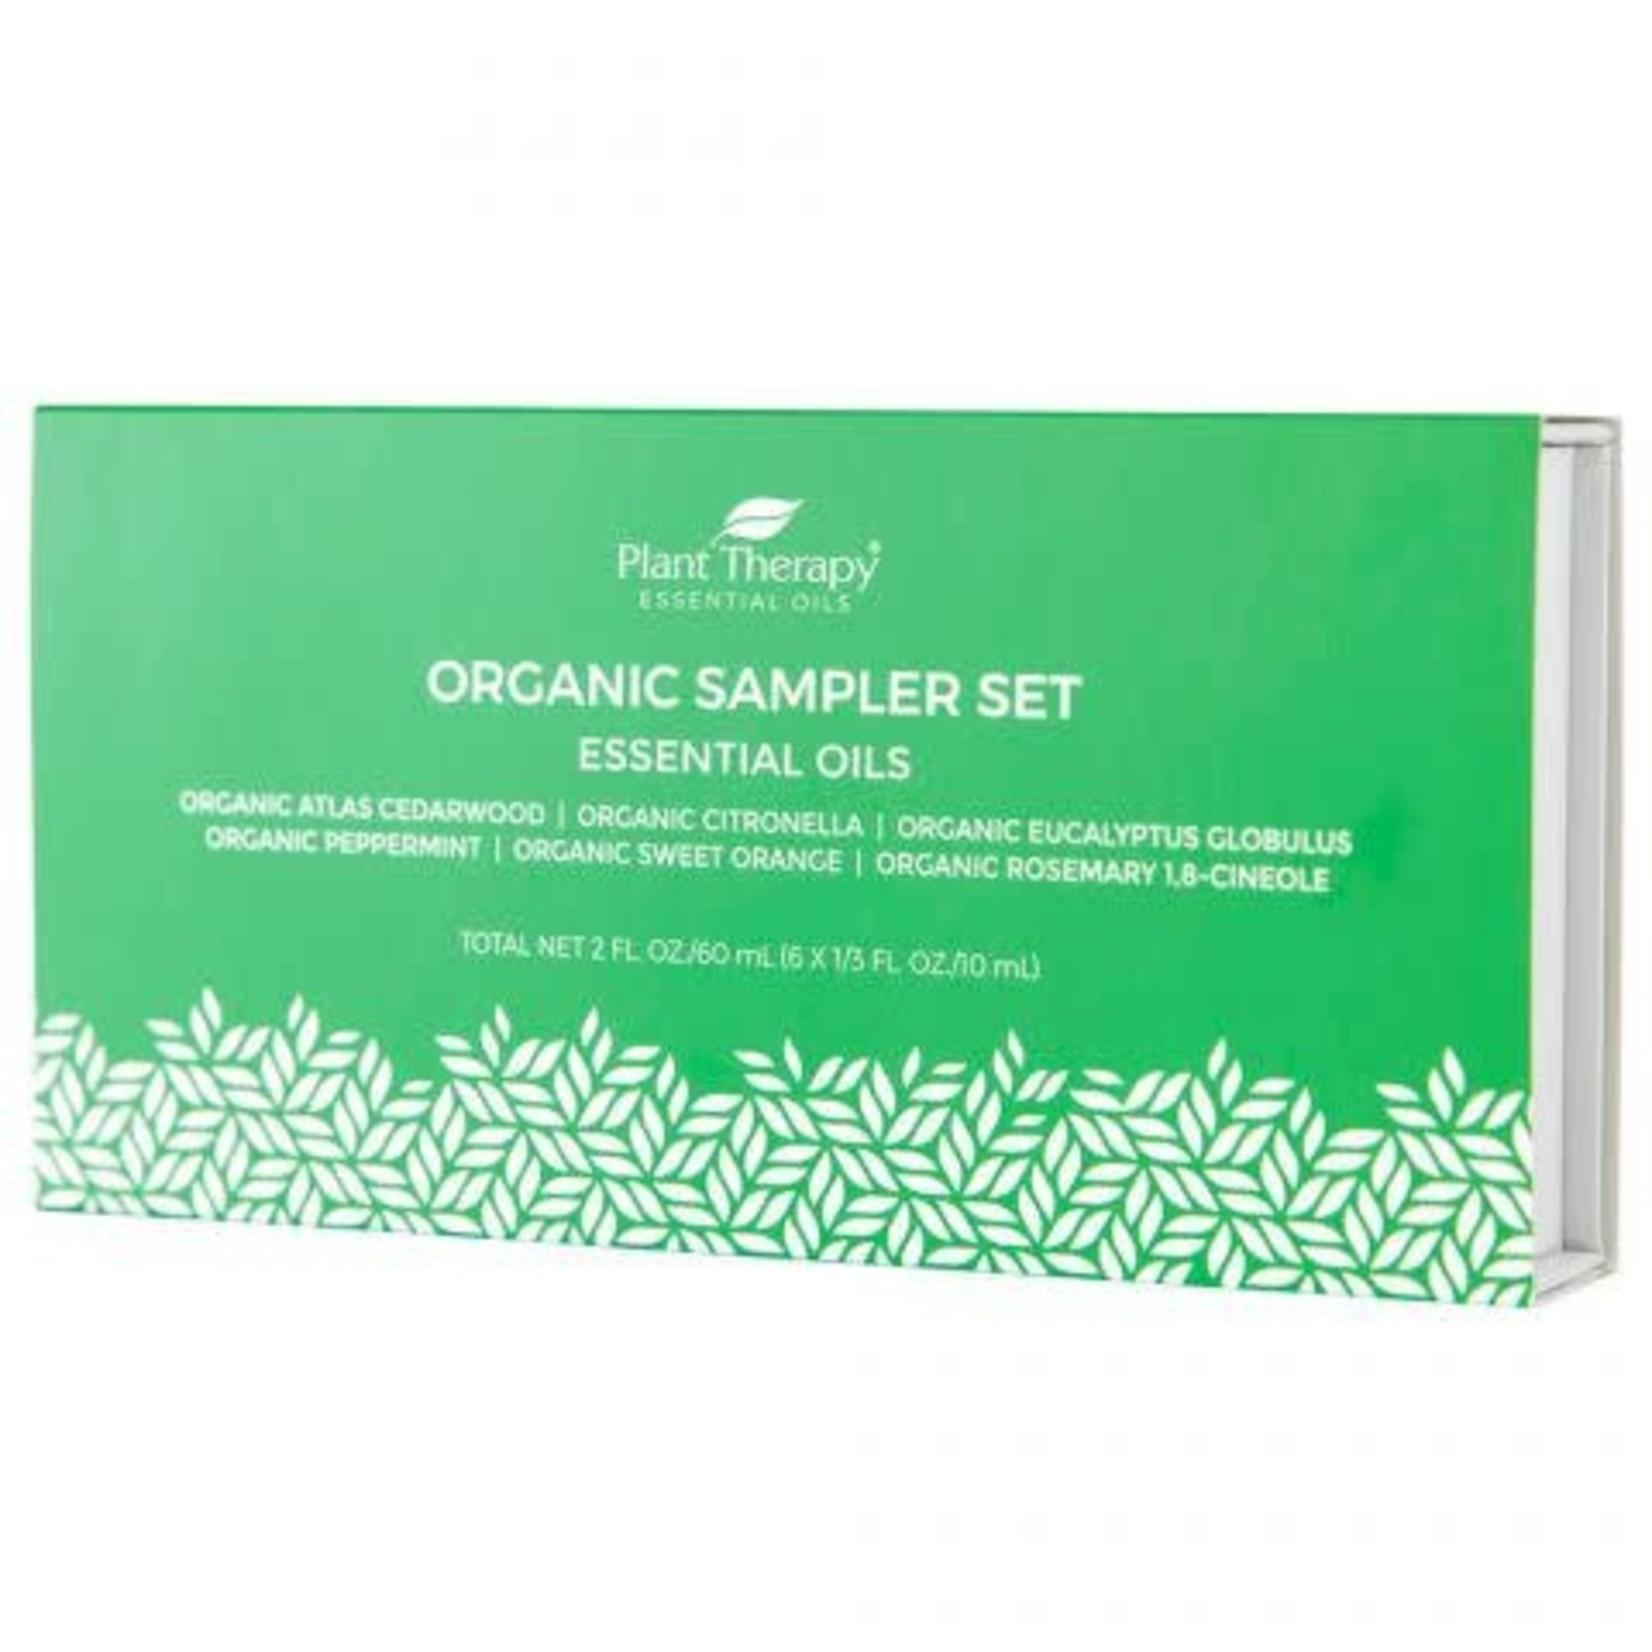 Plant Therapy PT Organic Sampler Set Essential Oils